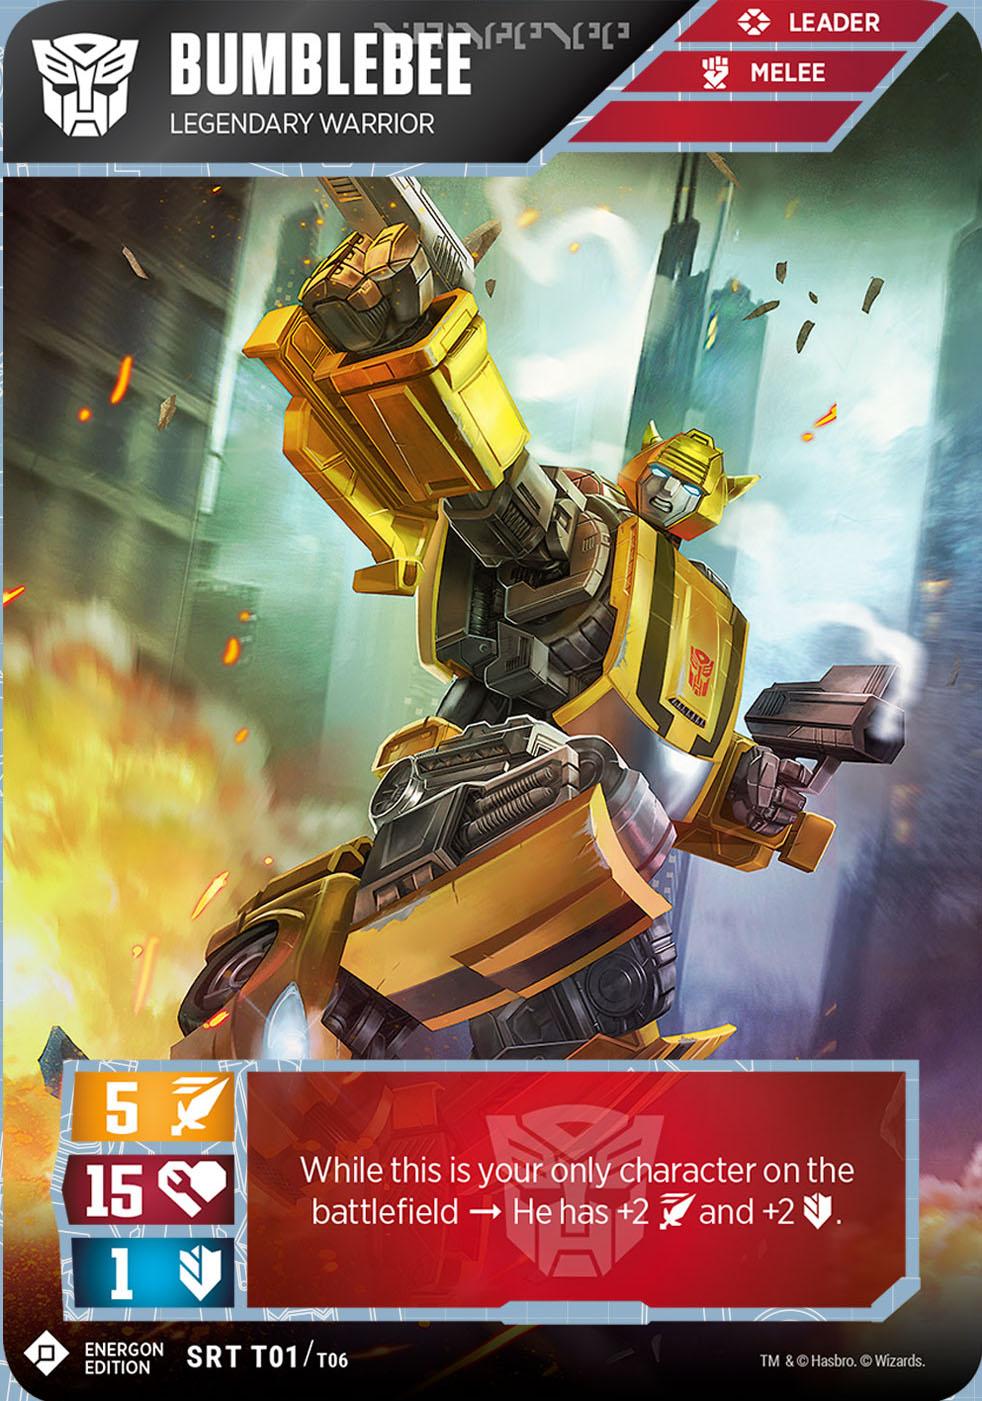 https://images.fortressmaximus.io/cards/ee1/character/bumblebee-legendary-warrior-EE1-bot.jpg